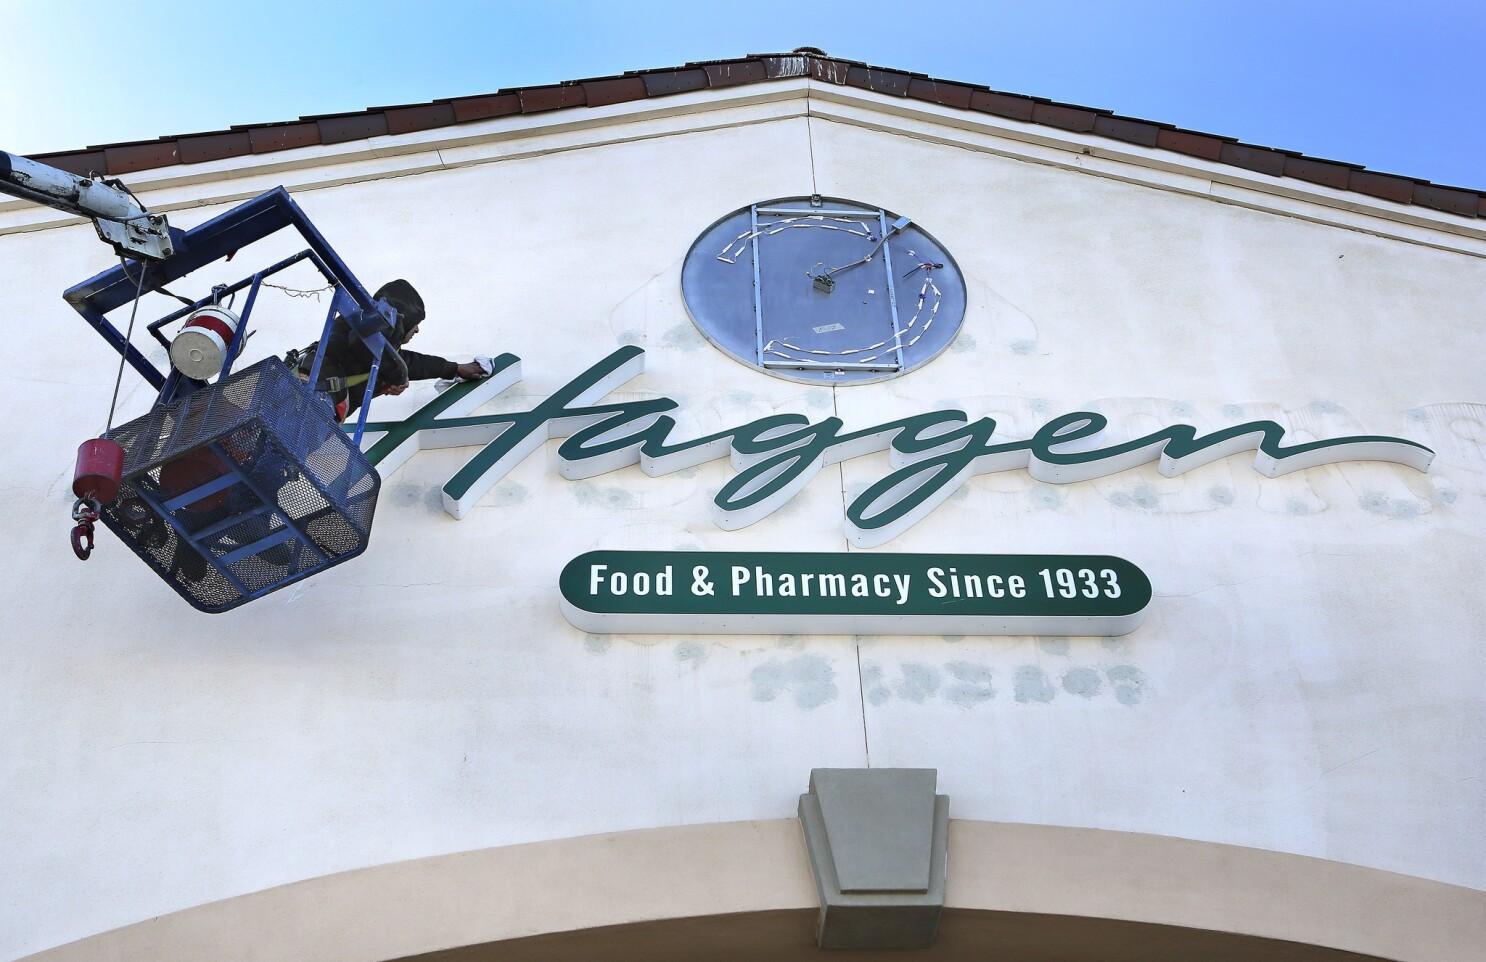 Albertsons Smart Final Win Bids For Haggen Stores New York Daily News